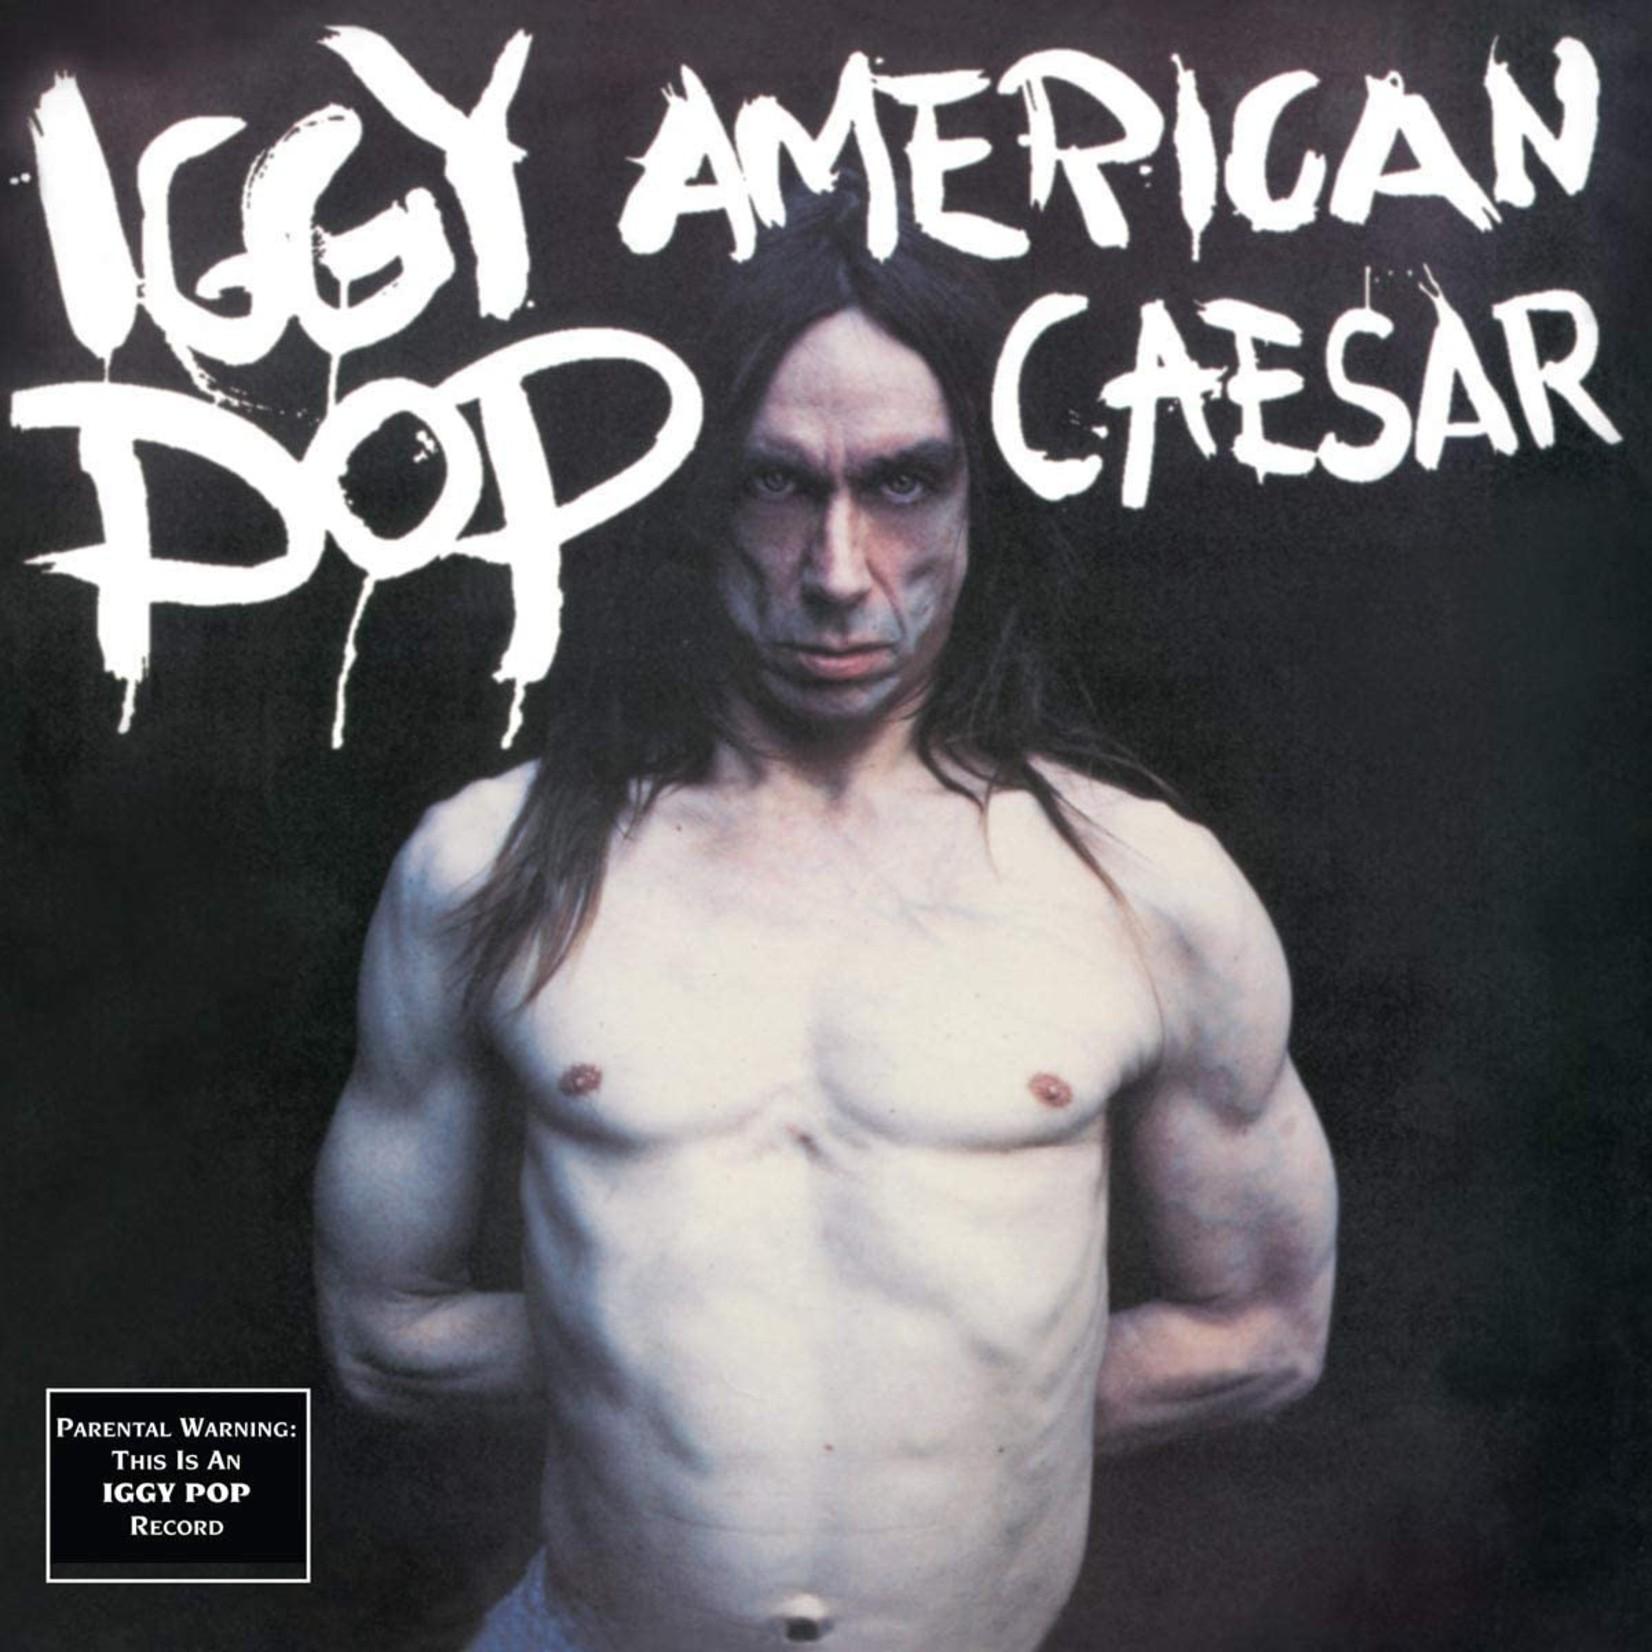 Vinyl Iggy Pop - American Caesar